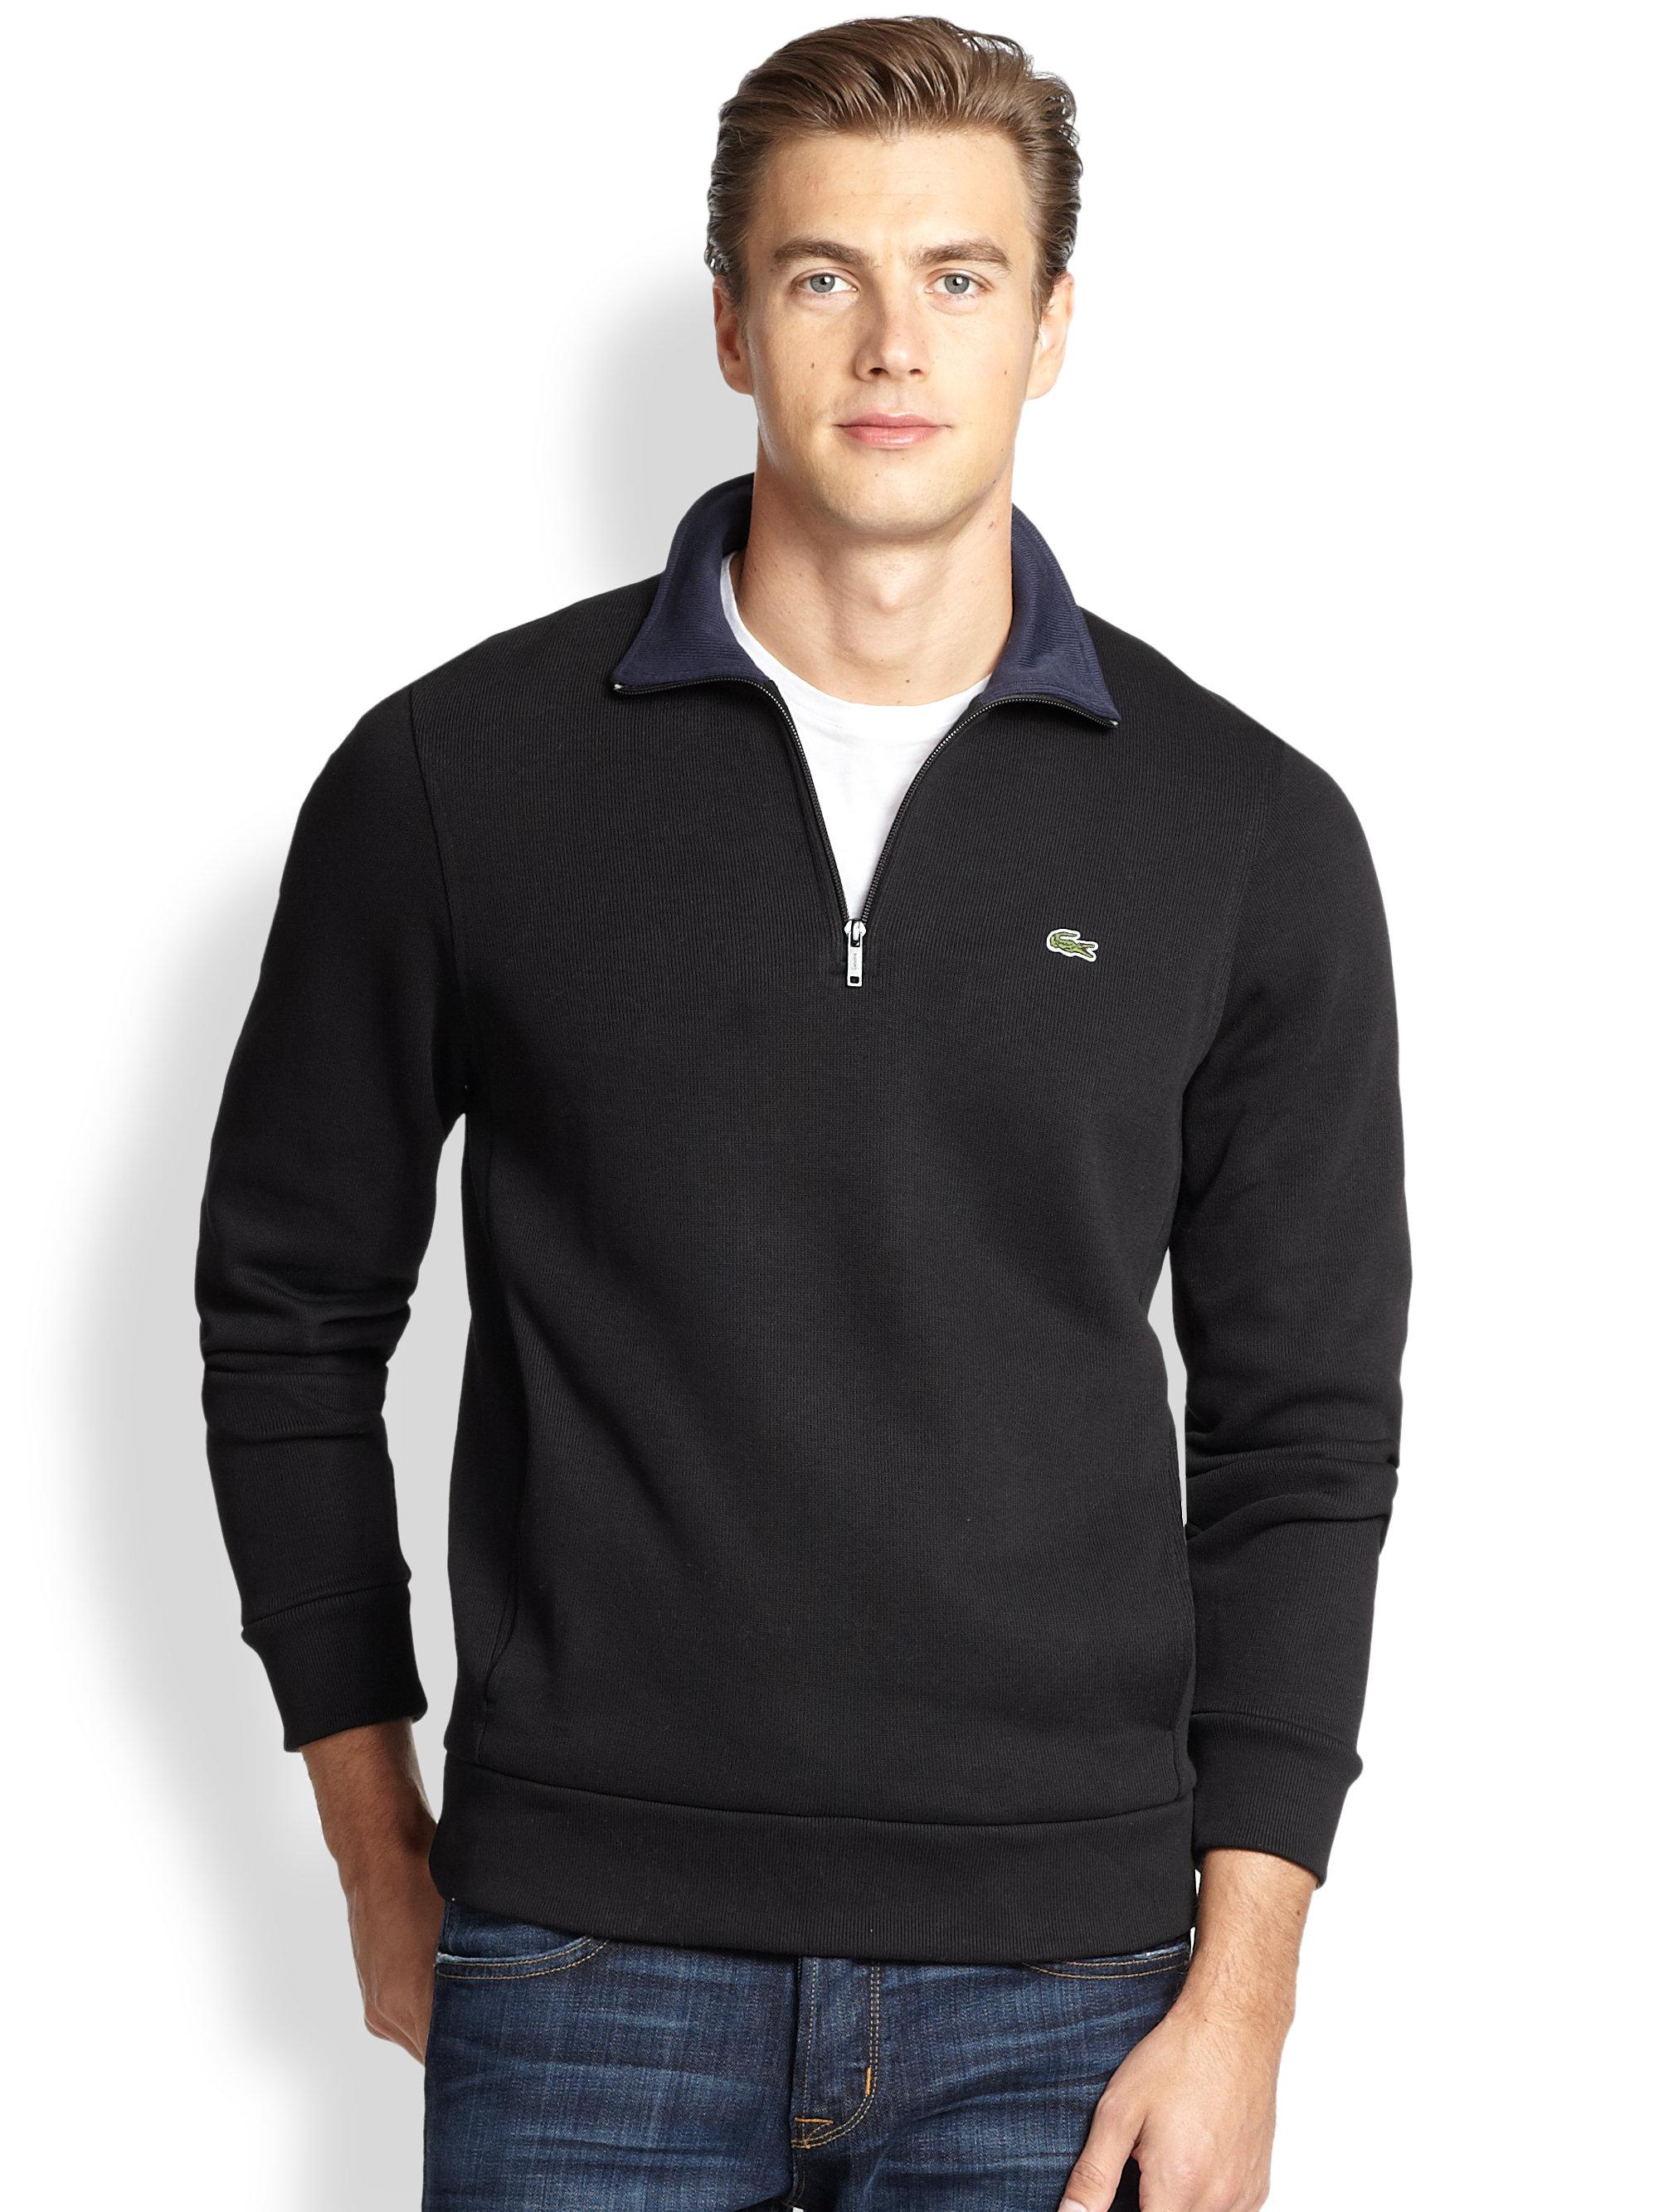 0088e9dbdc Black Lacoste Sweater Men For Pullover Half Zip Lyst In wYfxad7qd